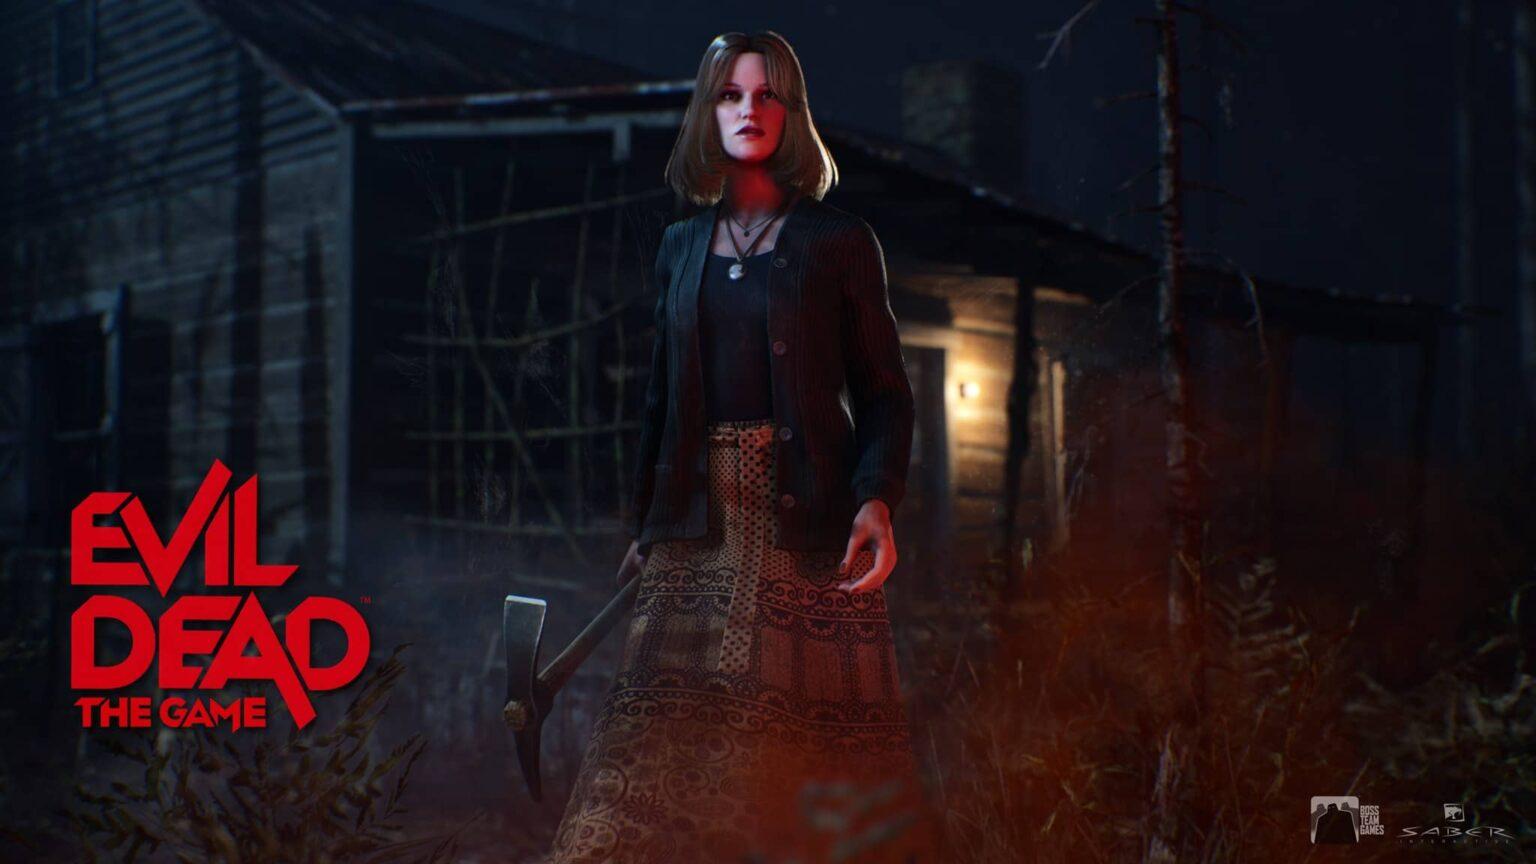 Evil Dead the game – Cheryl Williams